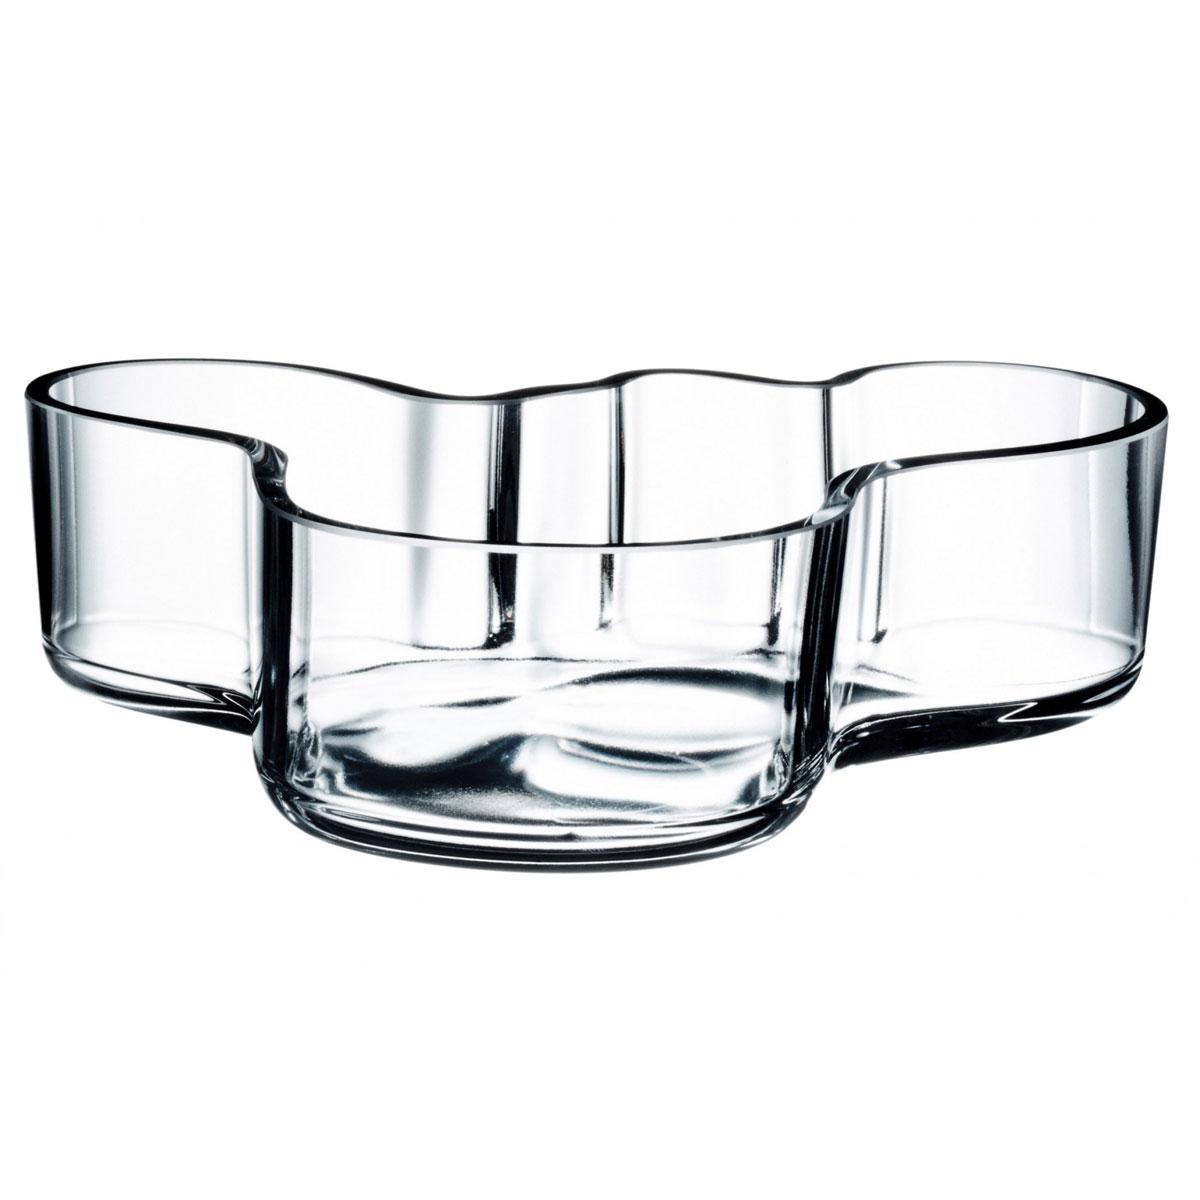 "Iittala Alvar Aalto 8"" Bowl"